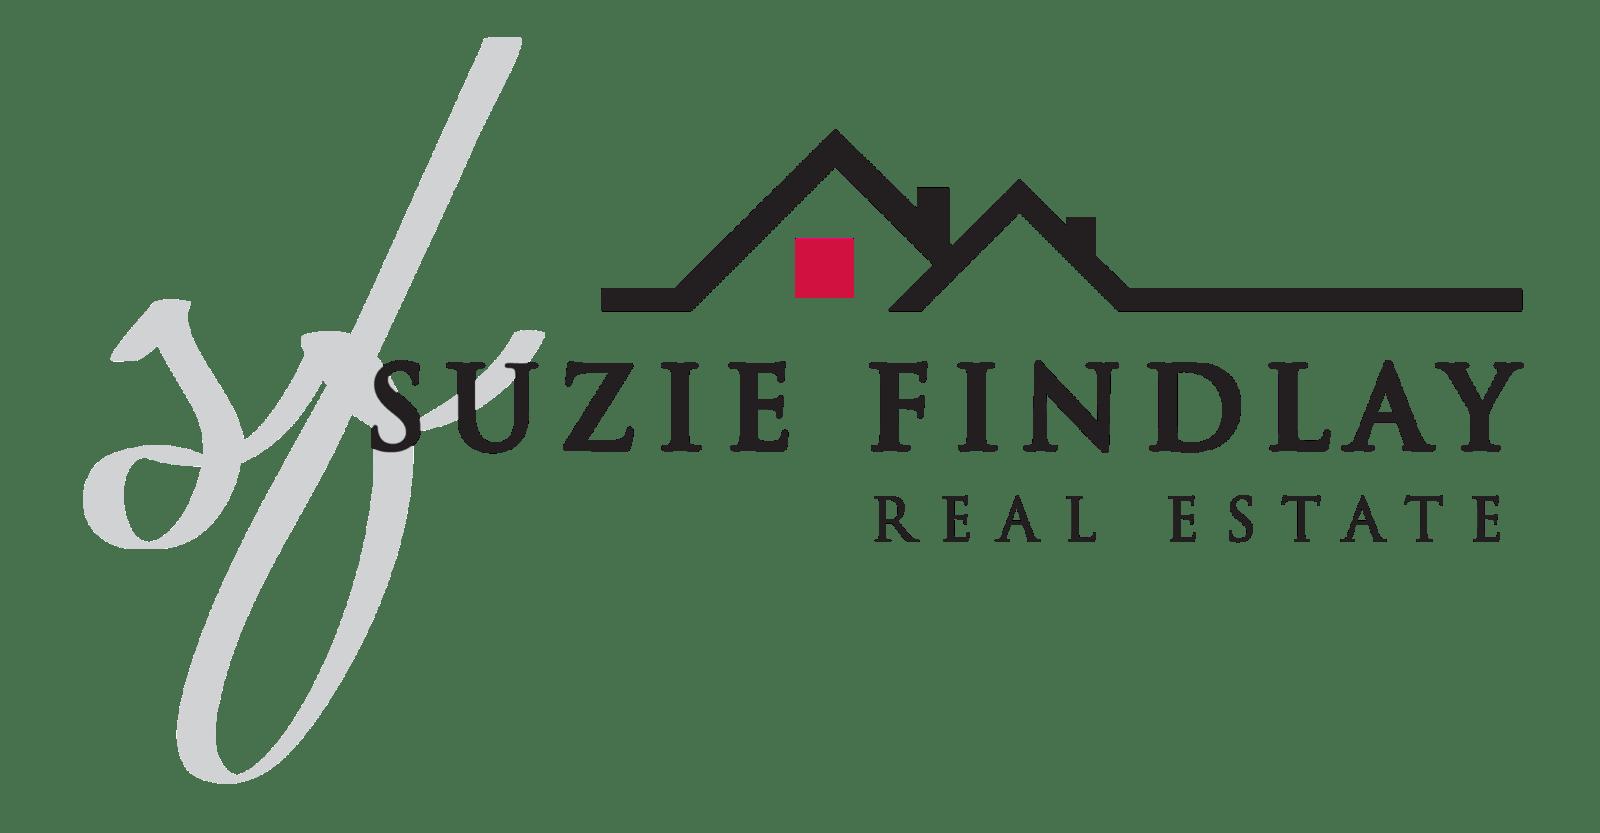 SUZIE FINDLAY